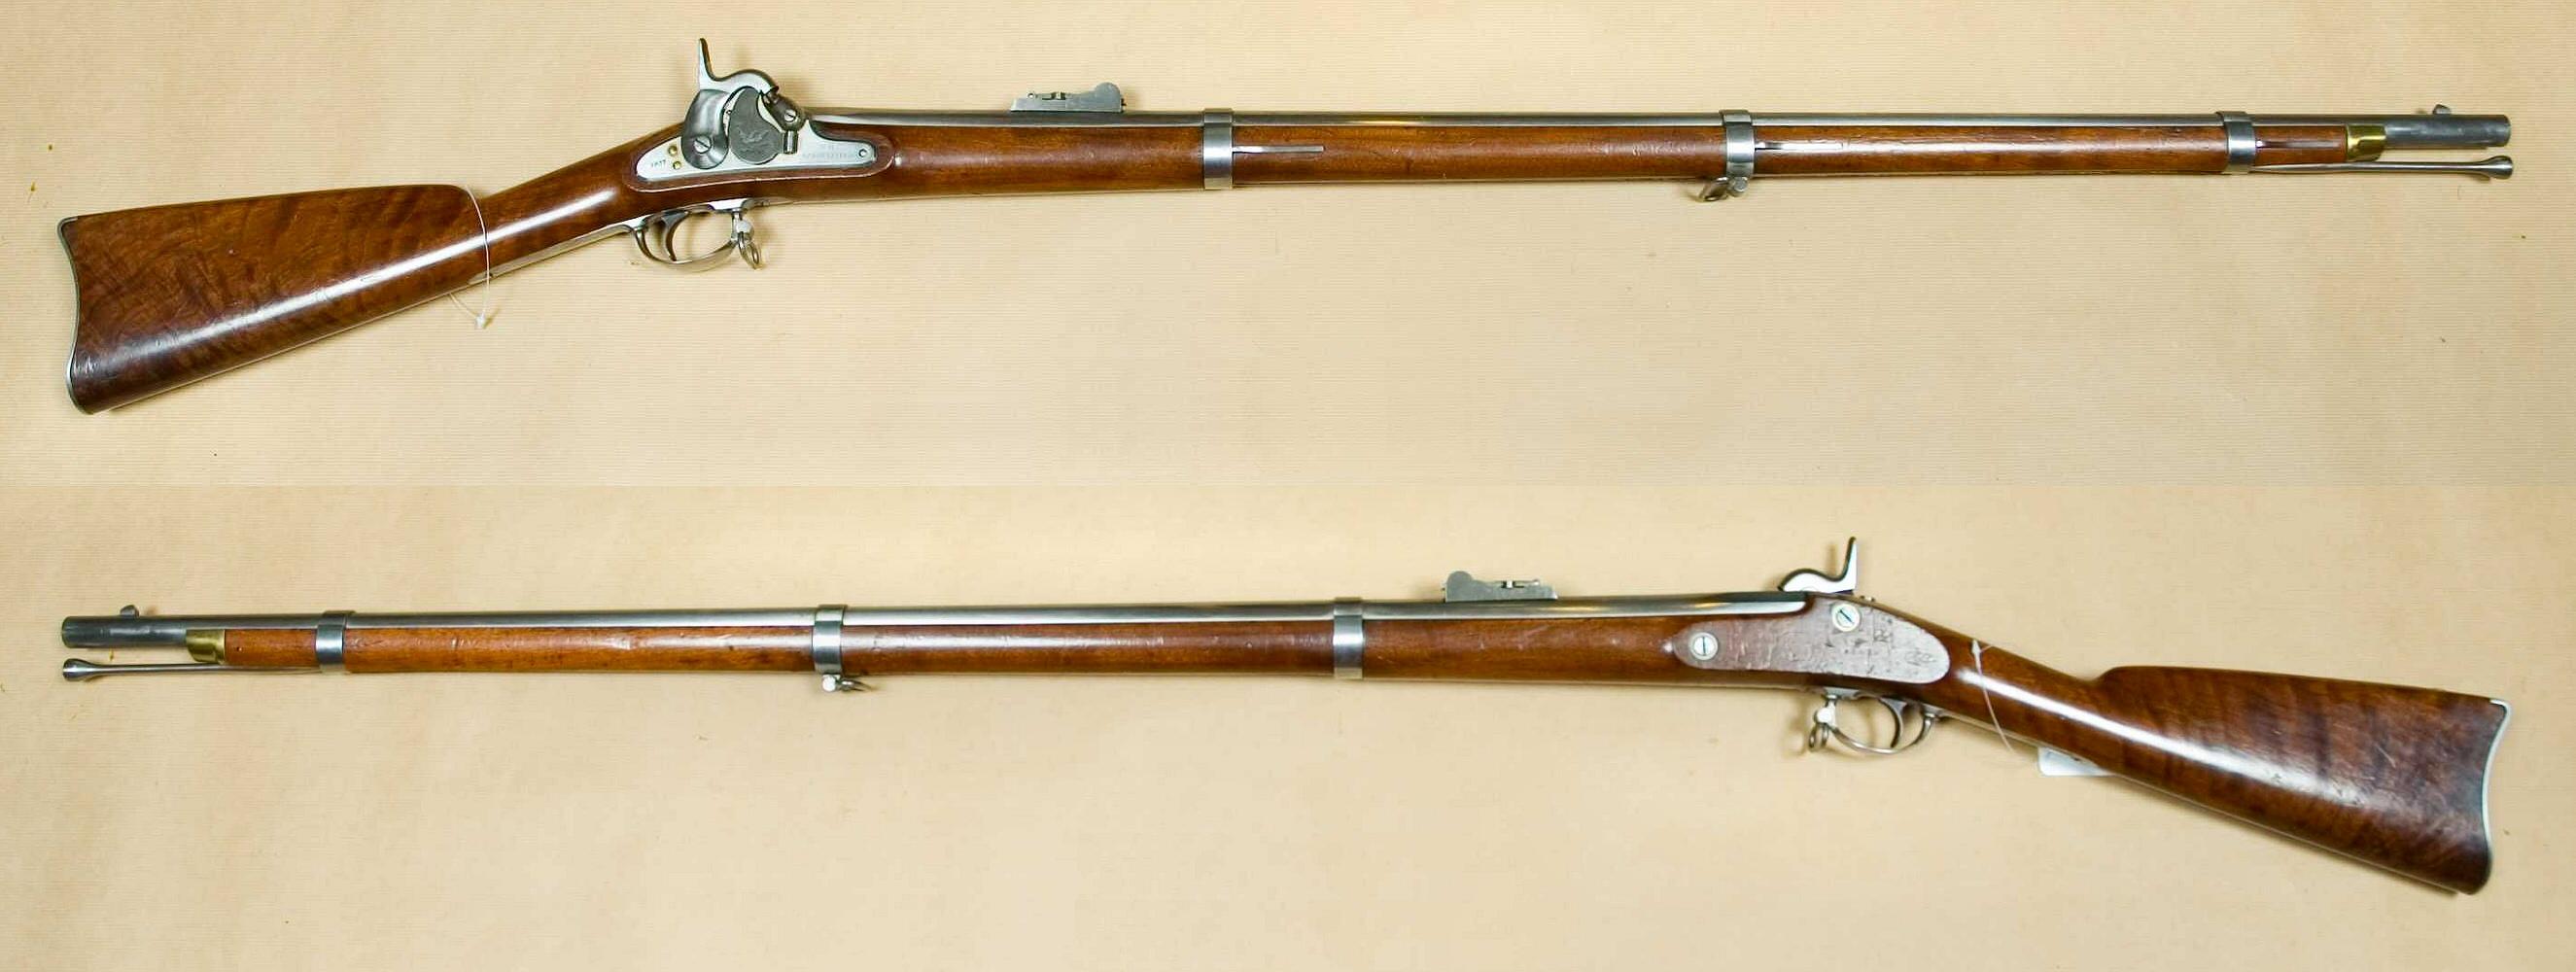 Springfield Model 1855 Military Wiki Fandom Powered By